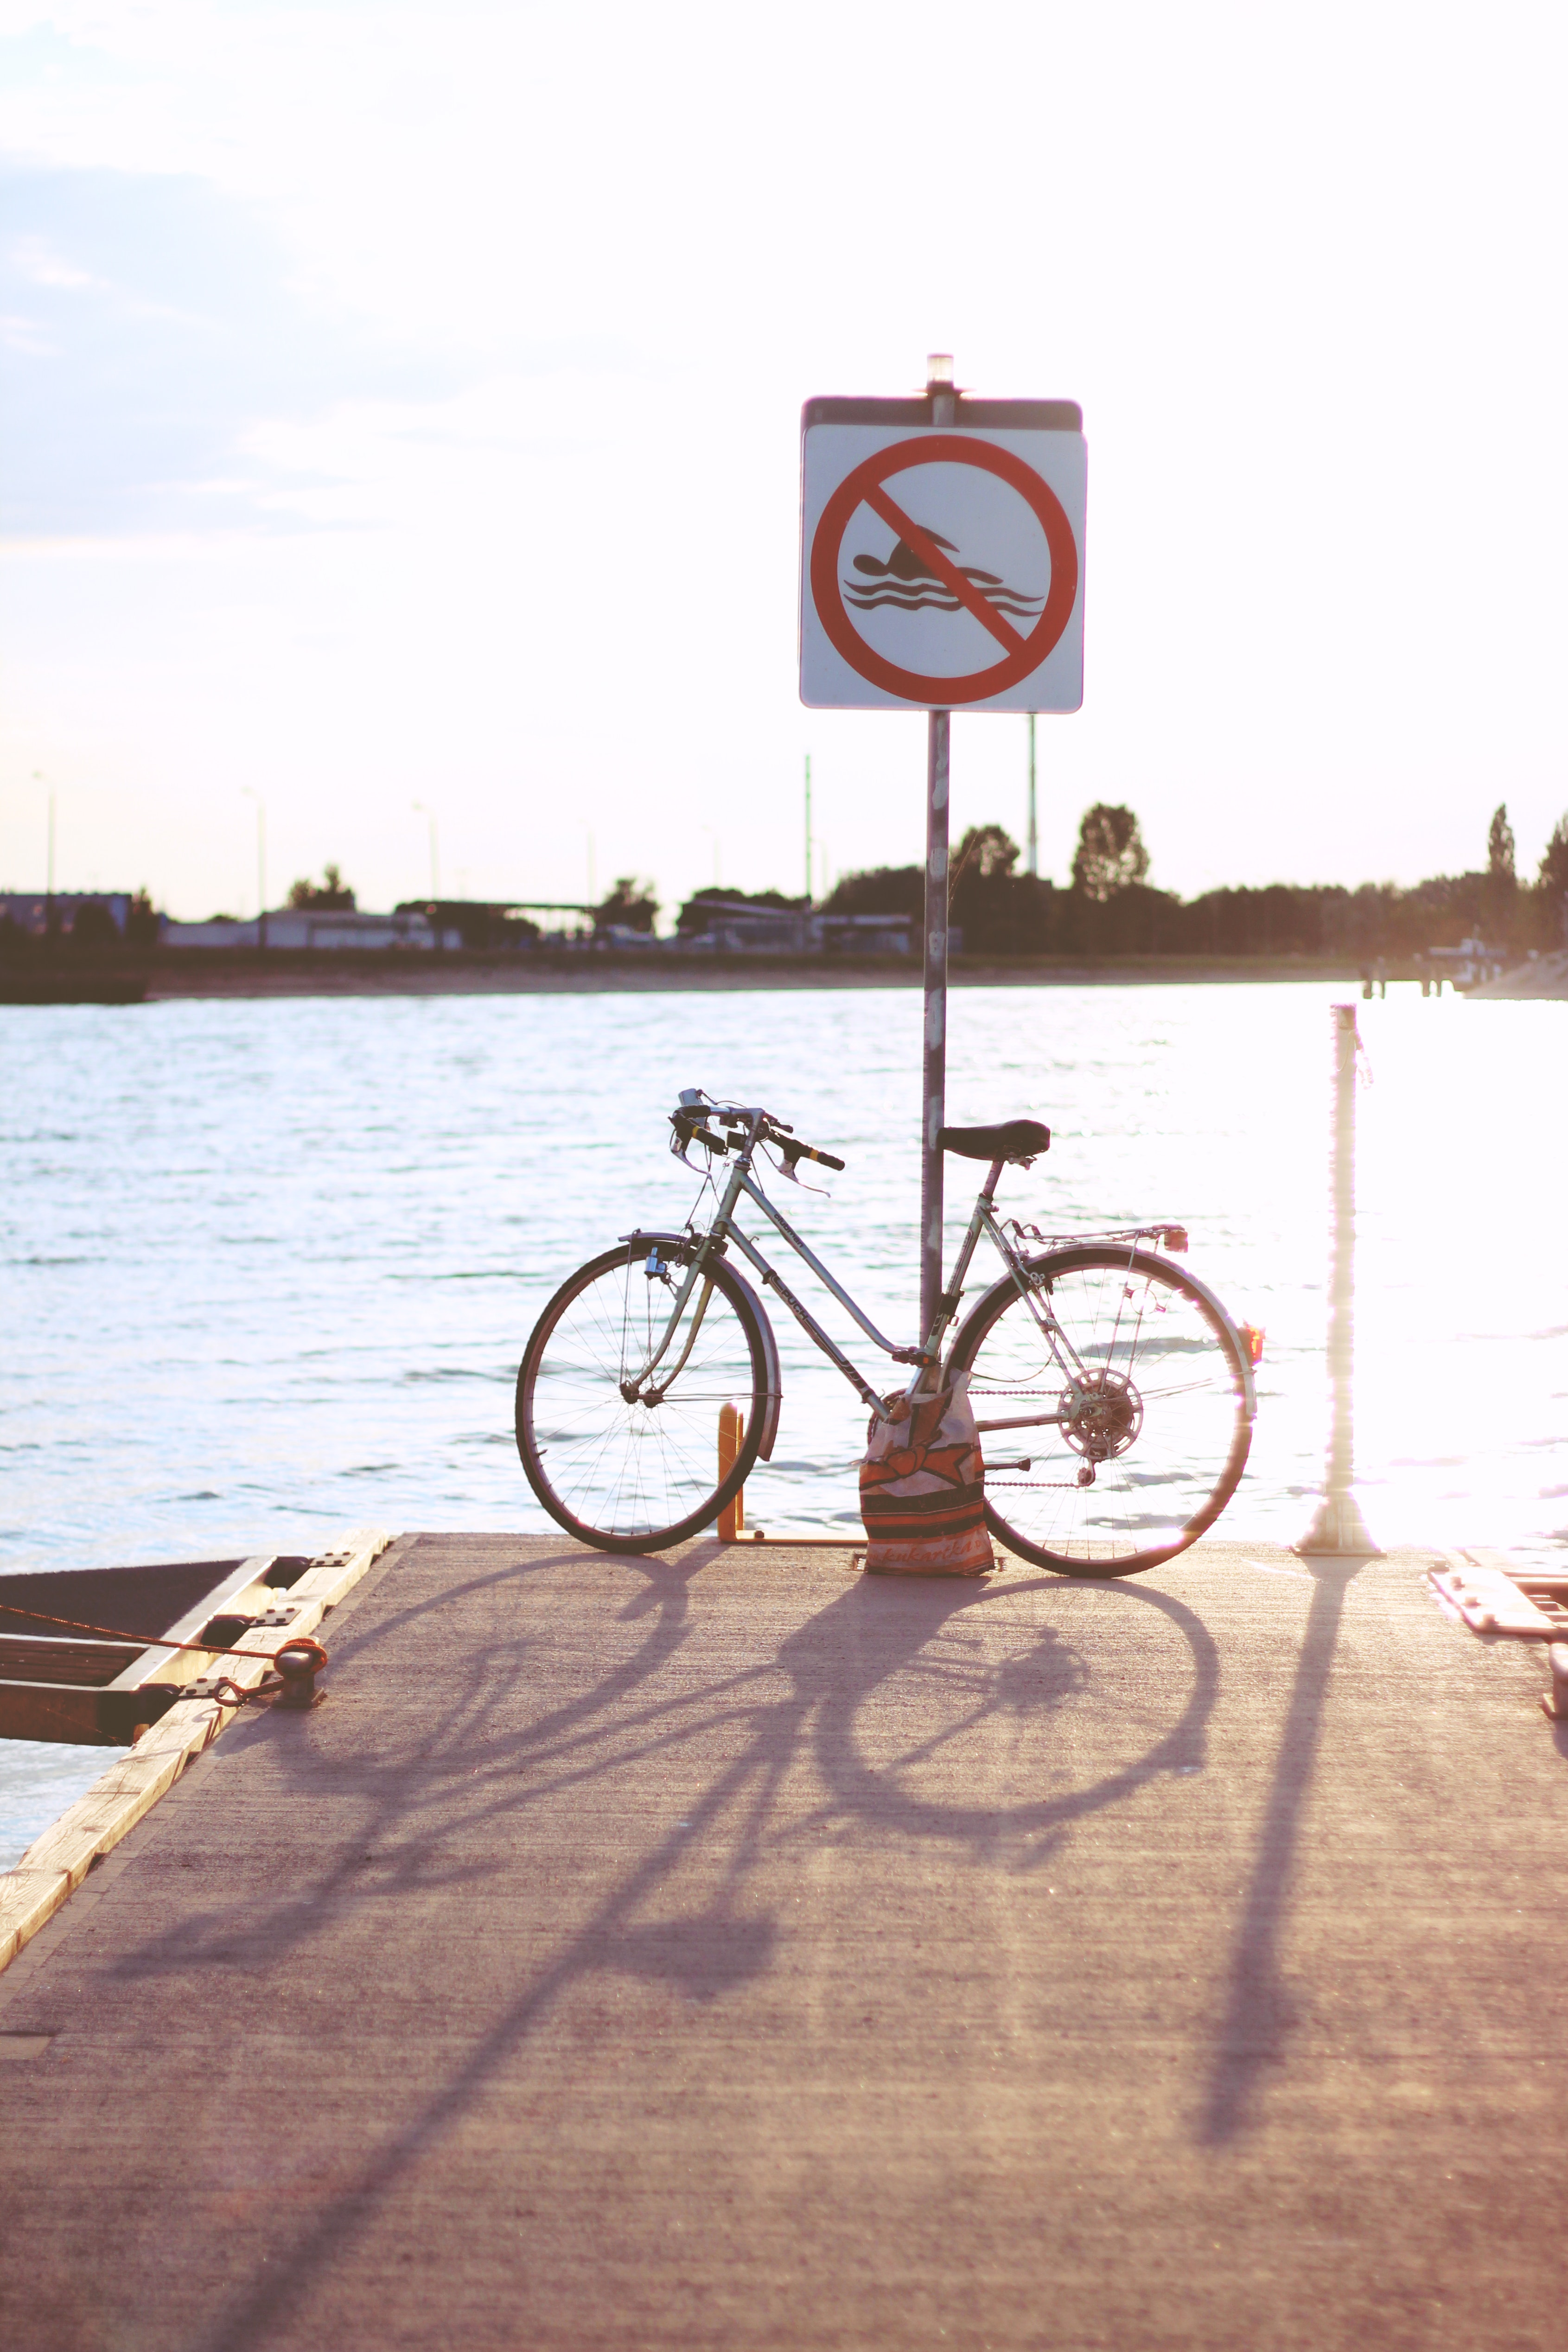 Sunset & bicycle photo